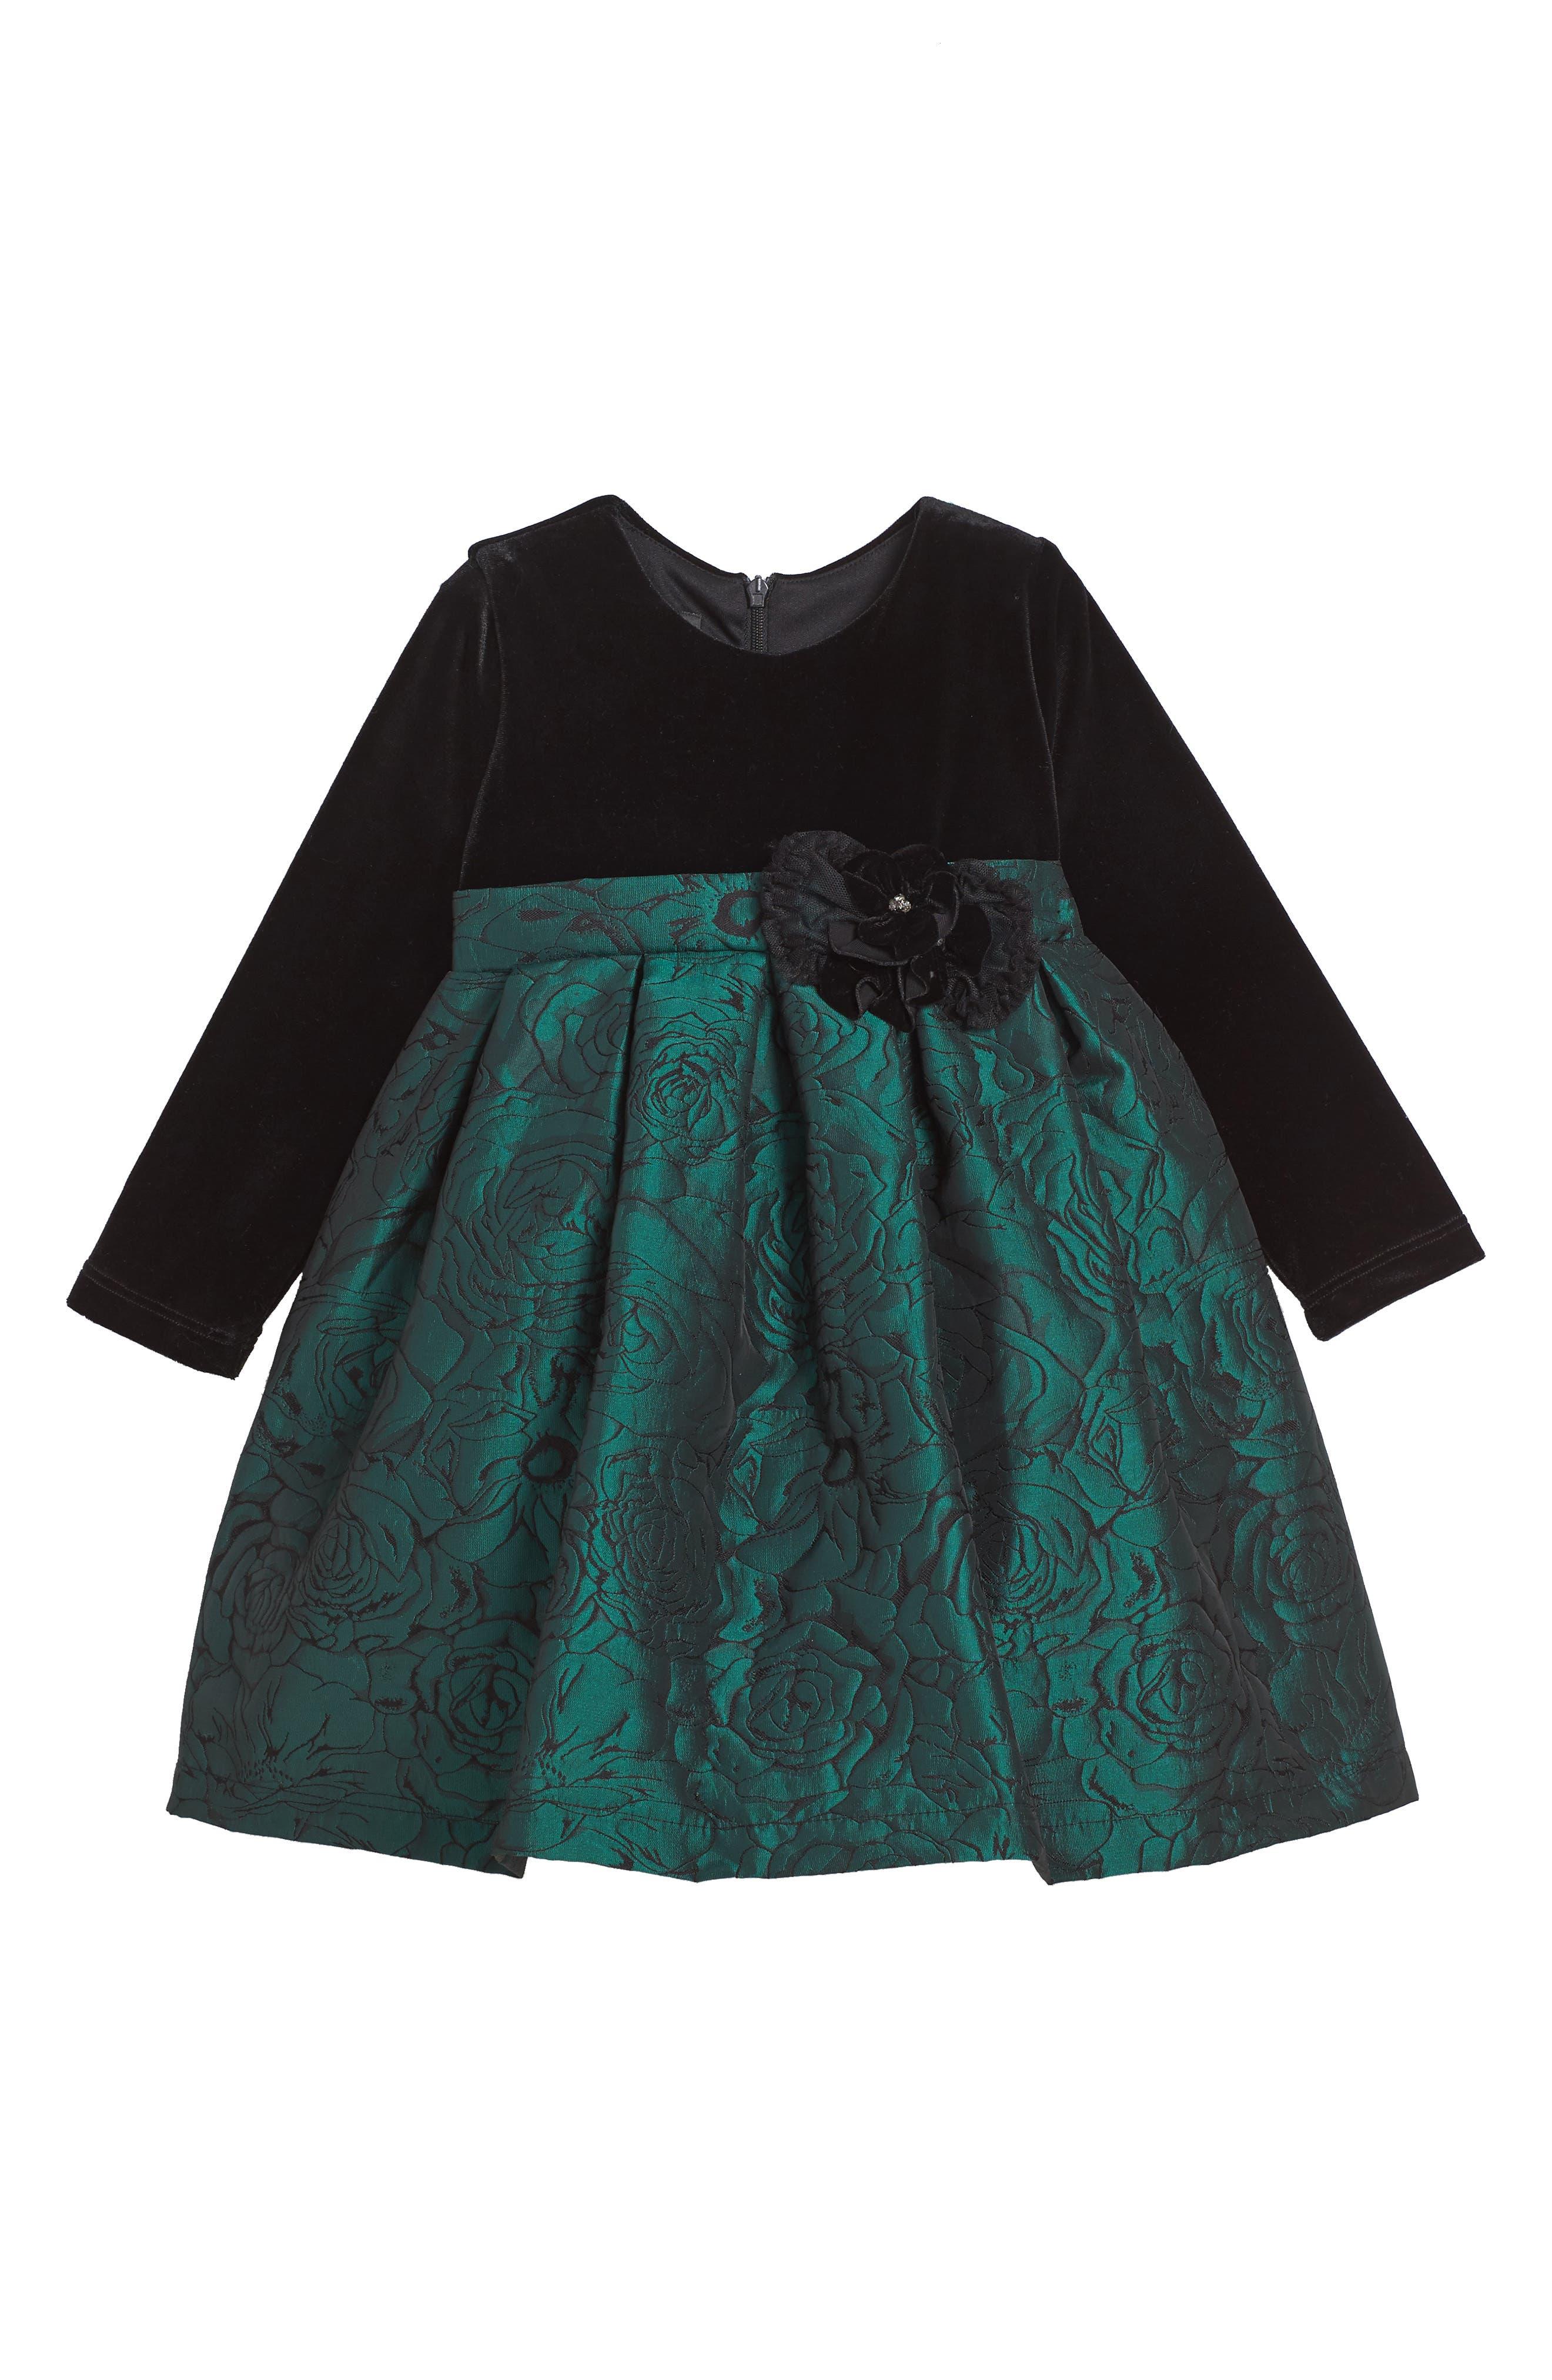 Mistletoe Dress,                         Main,                         color, 300